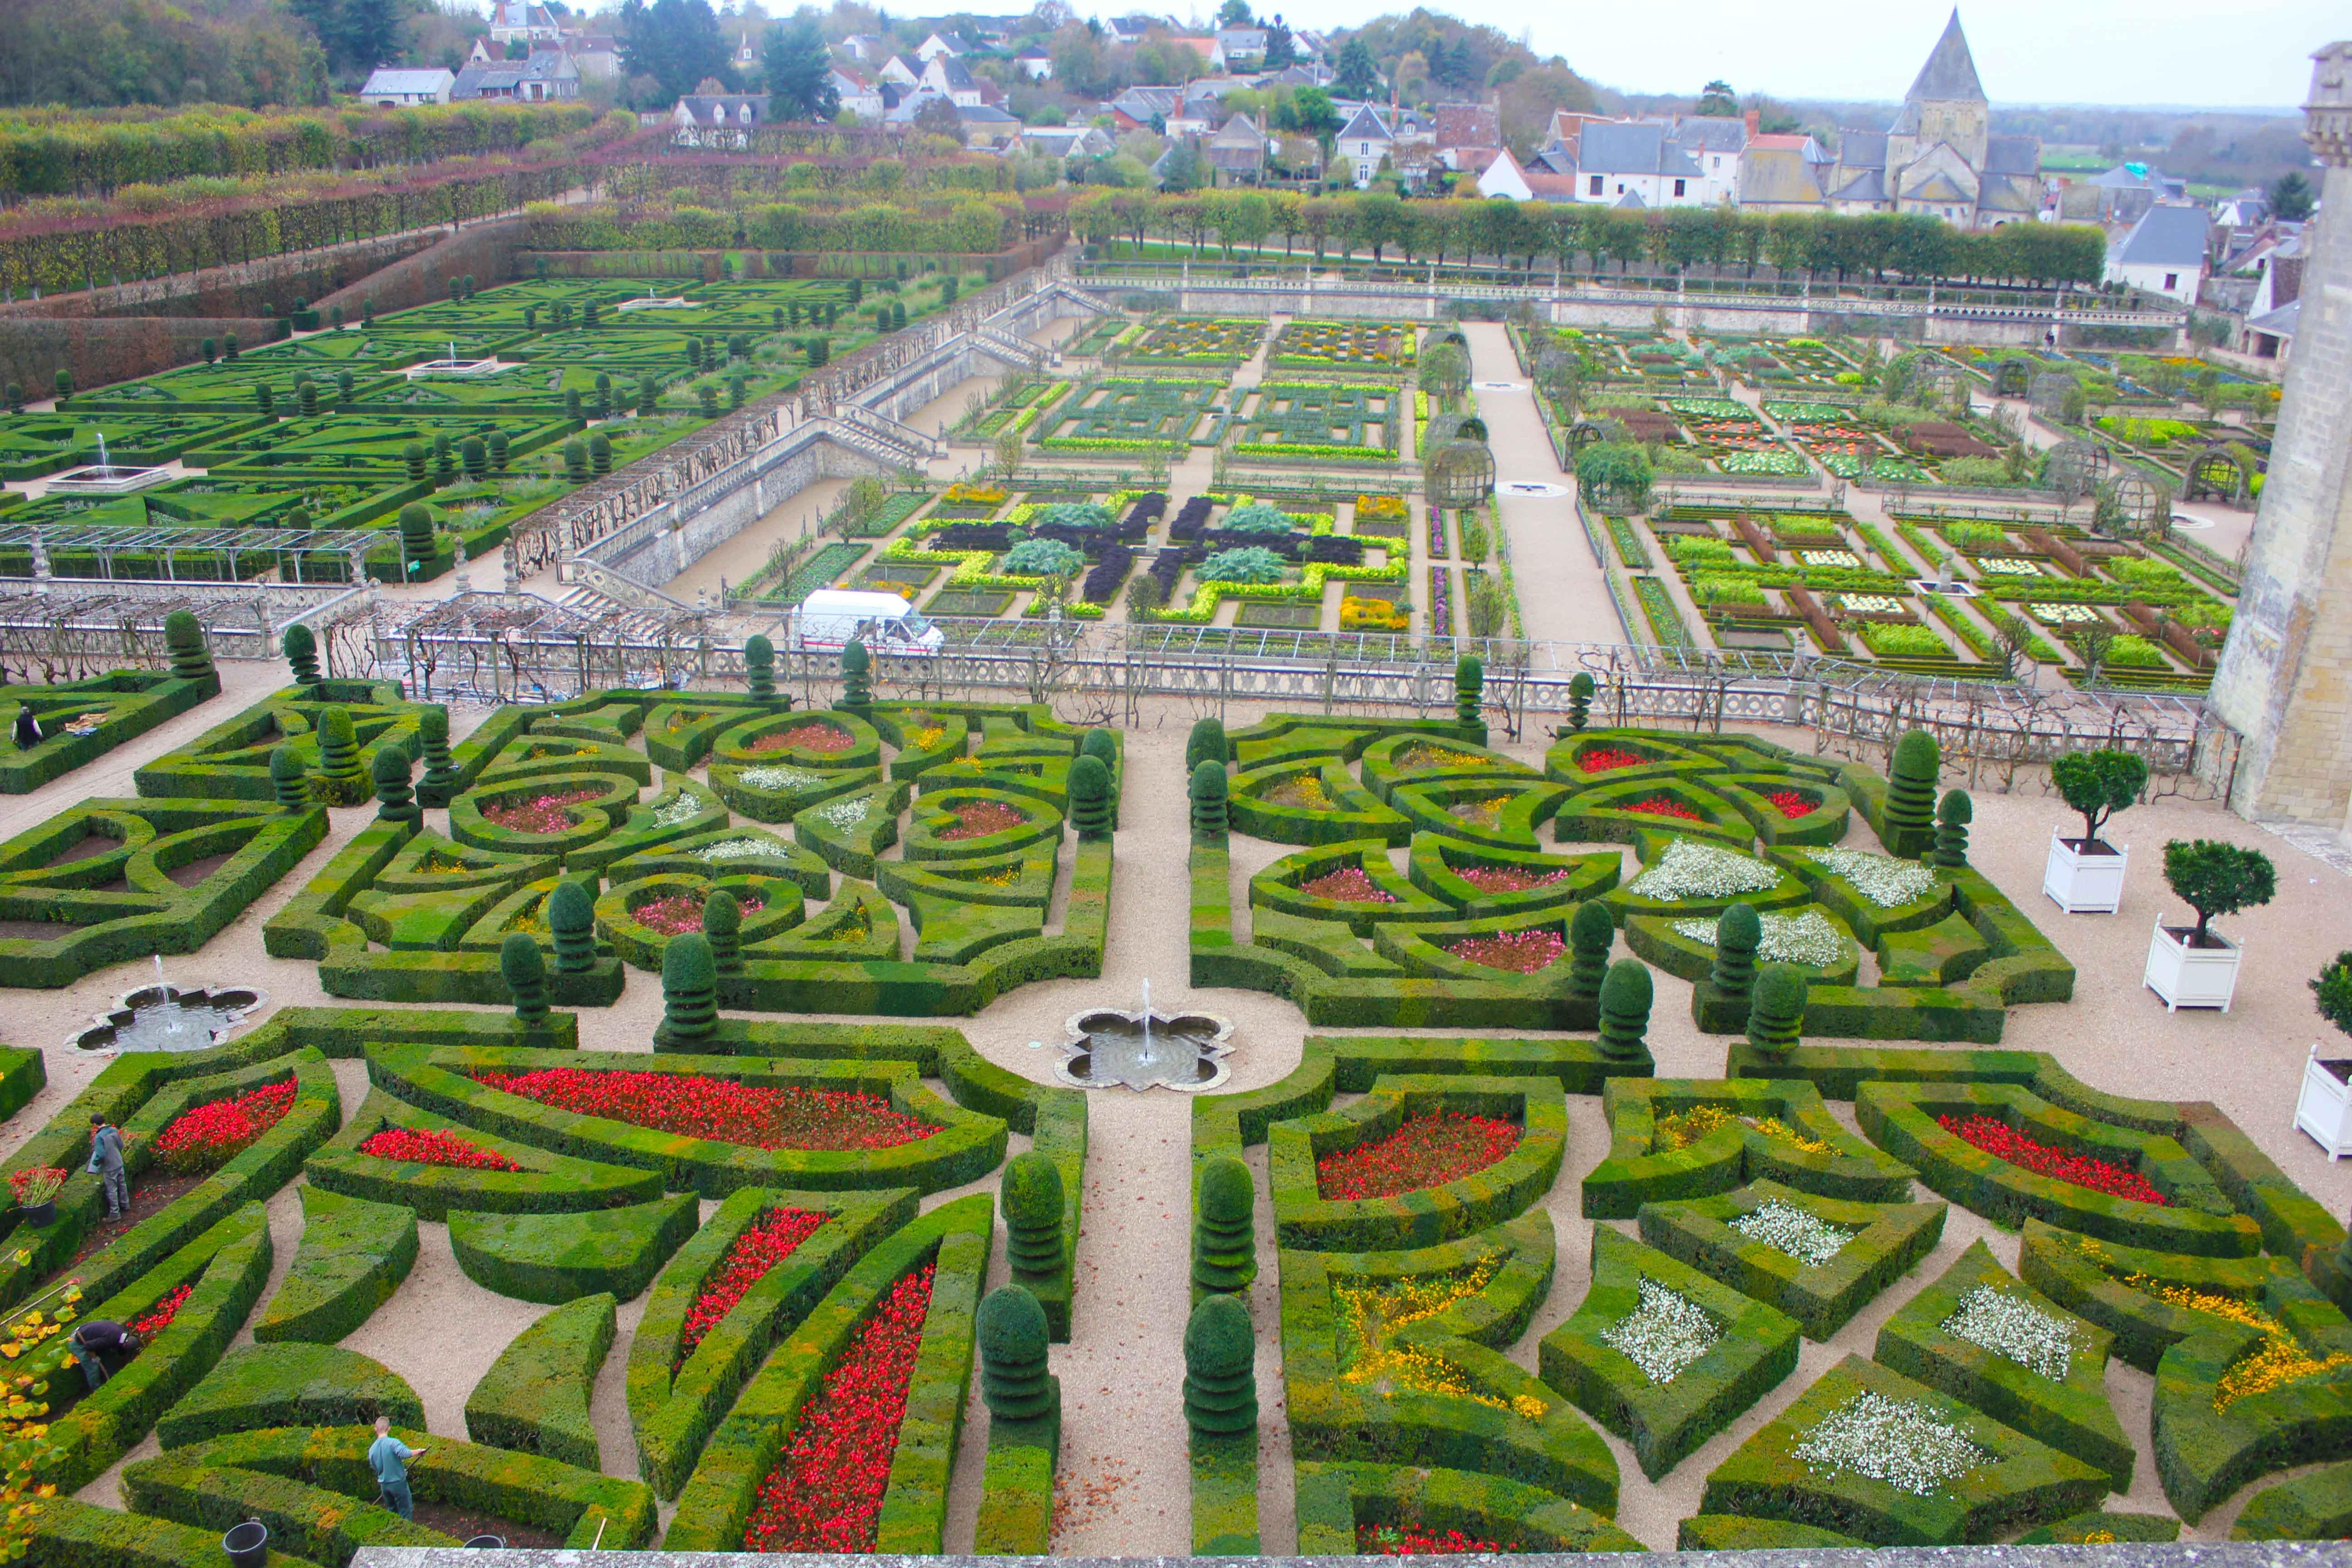 Os jardins renascentistas do Villandry